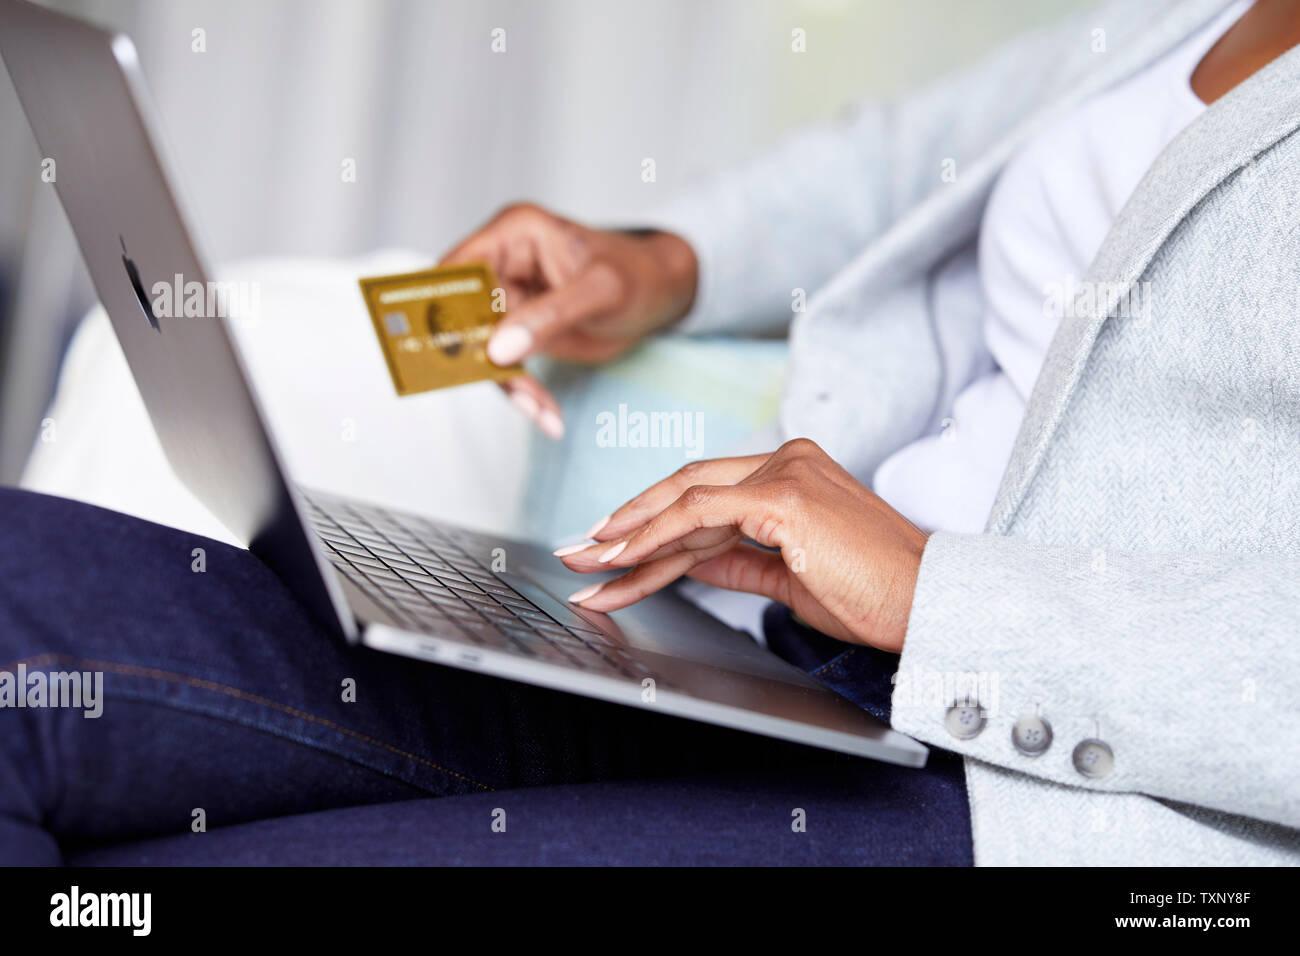 Ethnic woman shopping online using laptop Stock Photo